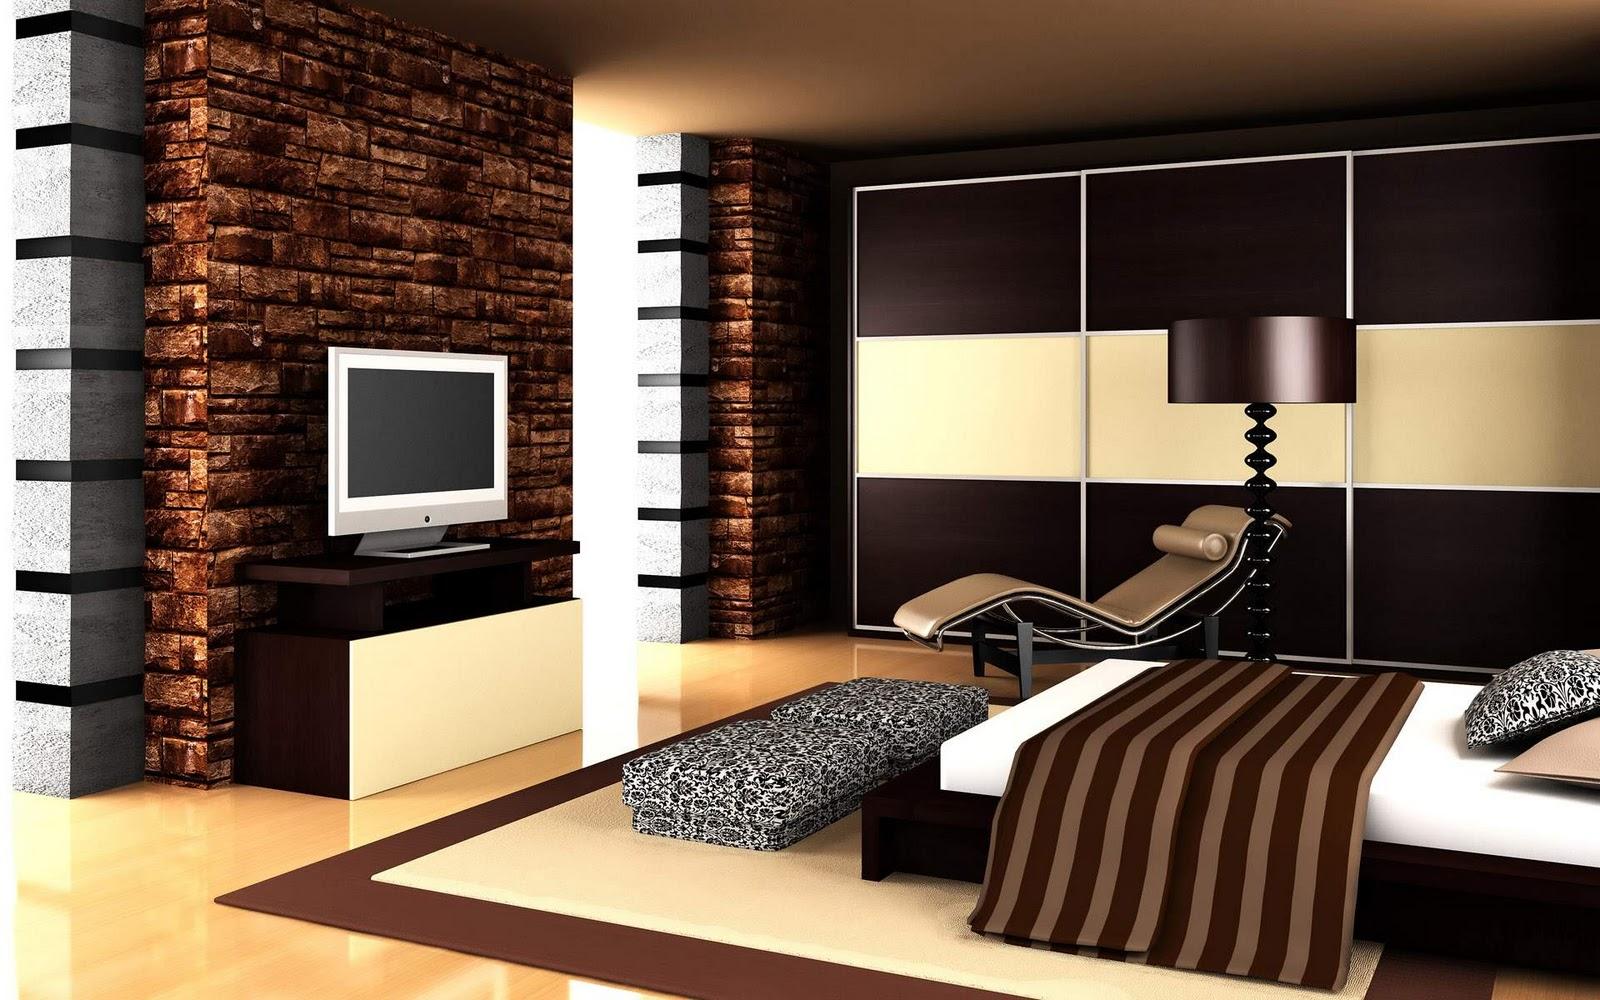 All new pix1: wallpaper eddsworld